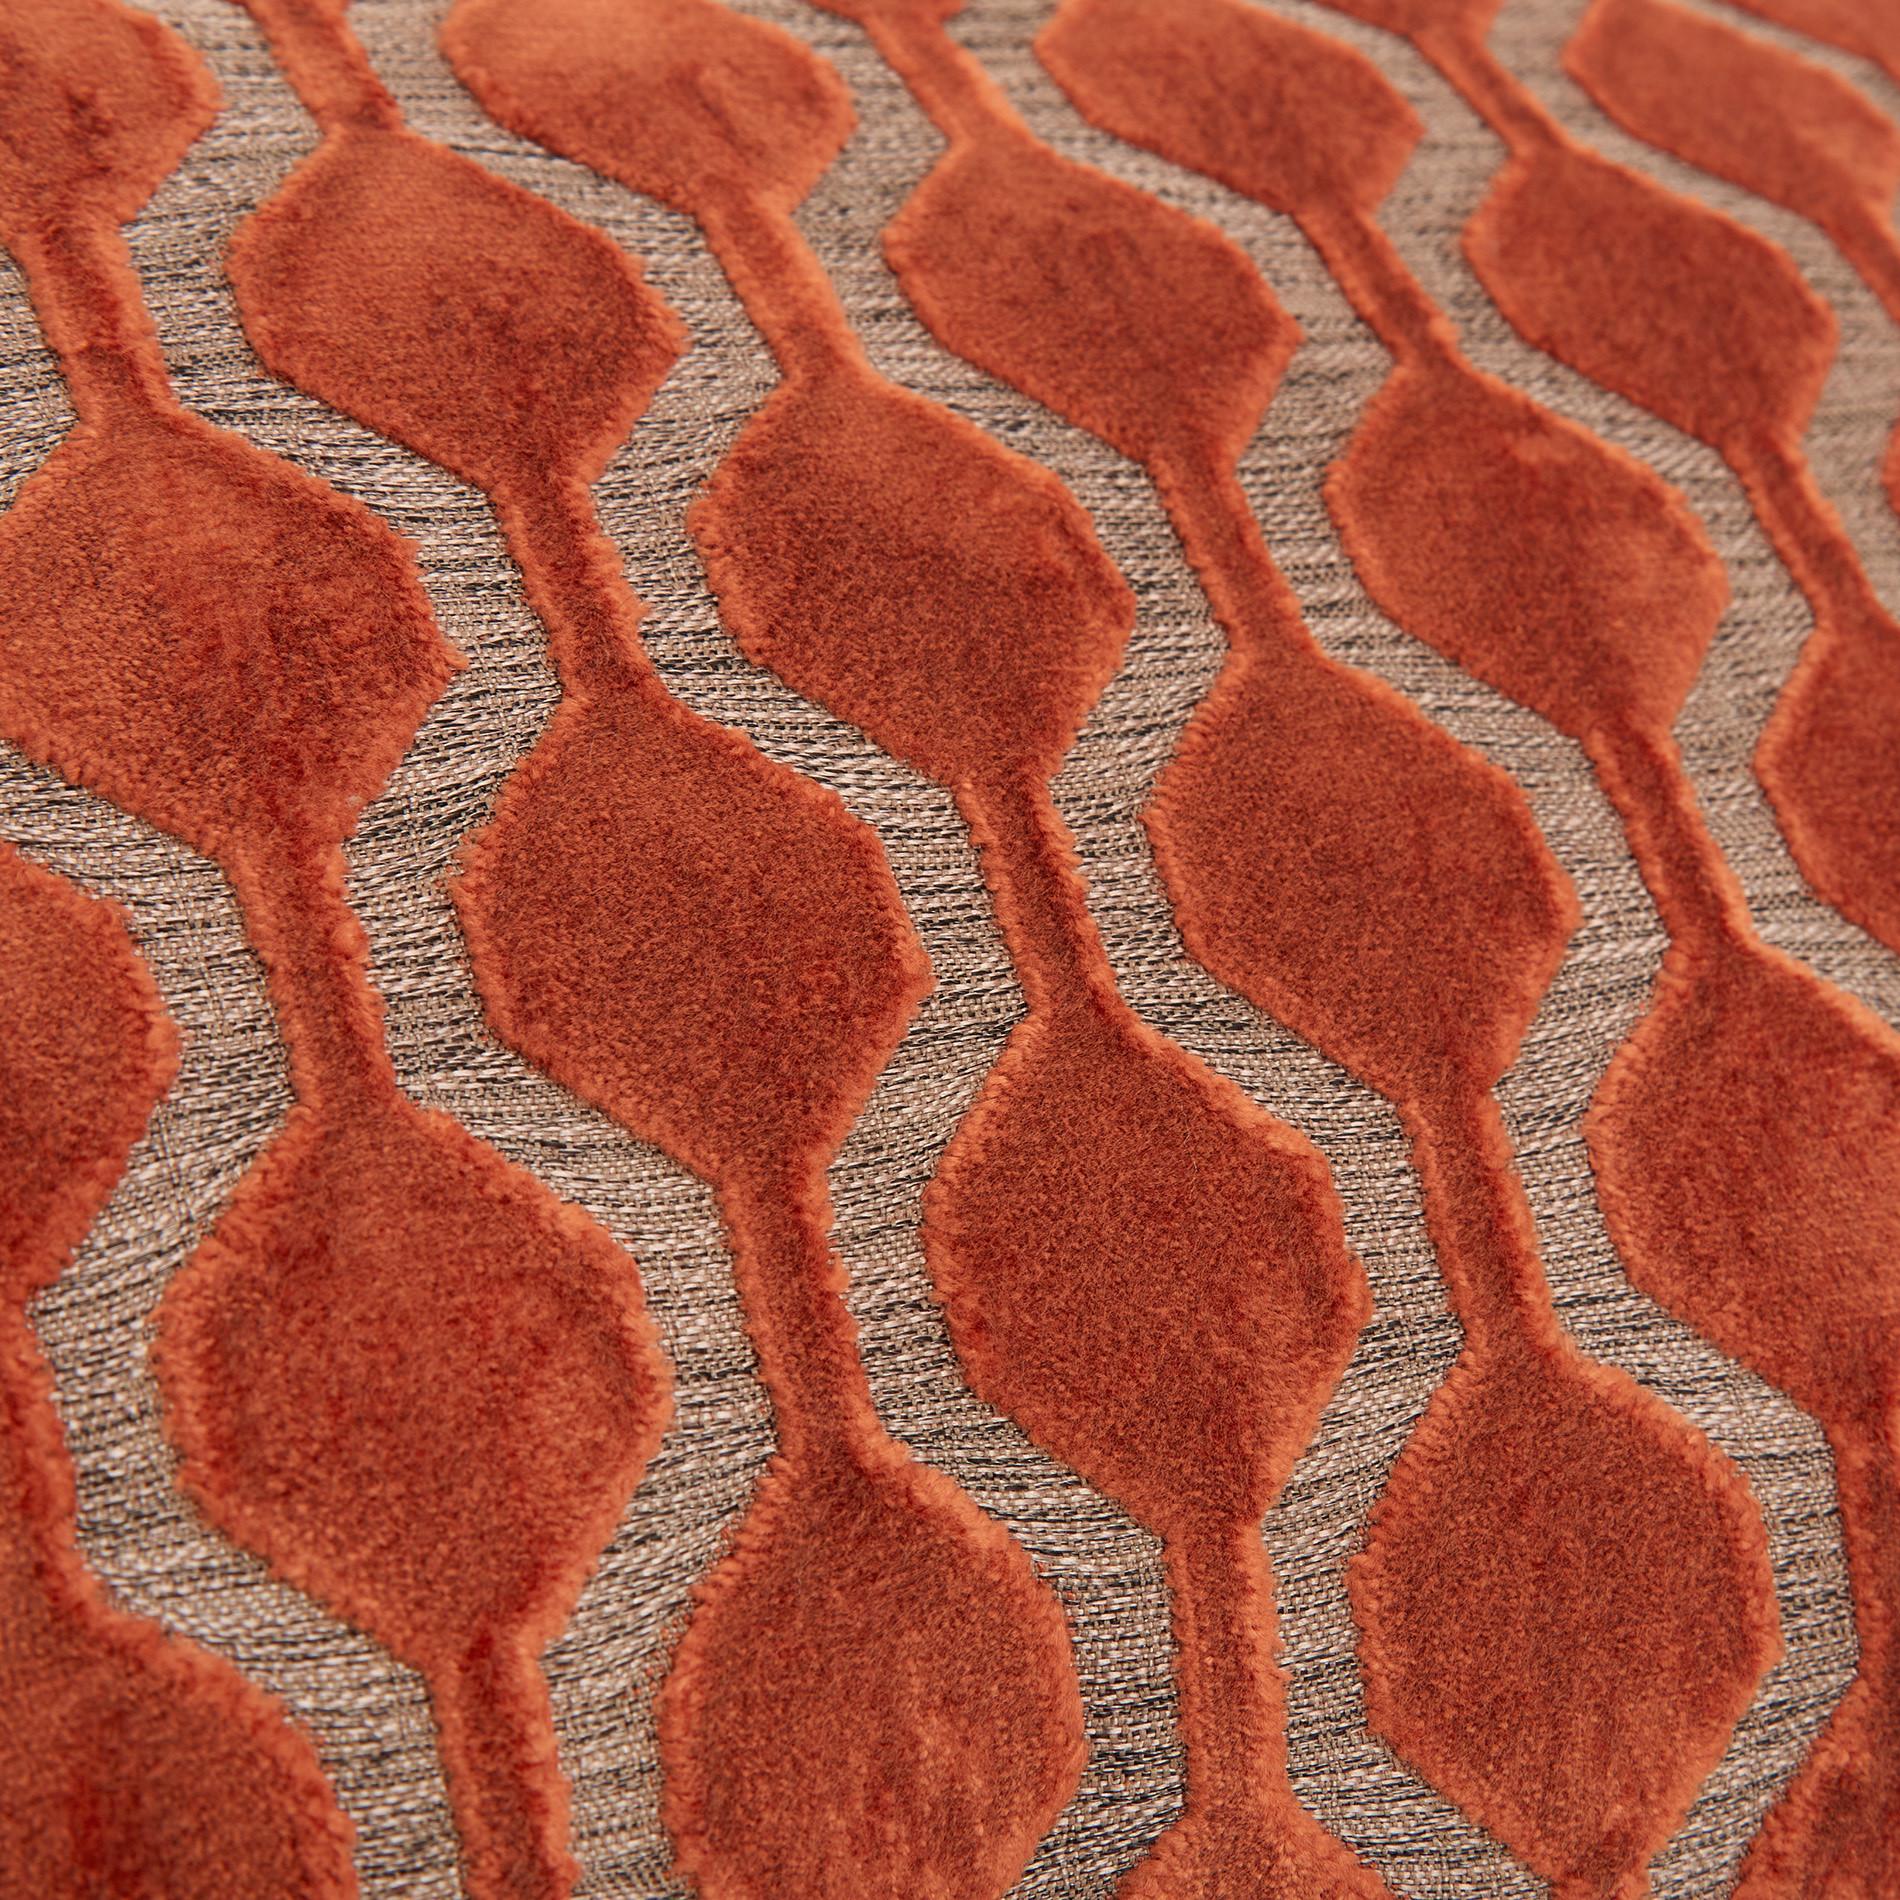 Cuscino velluto motivo geometrico 35x55cm, Marrone chiaro, large image number 3